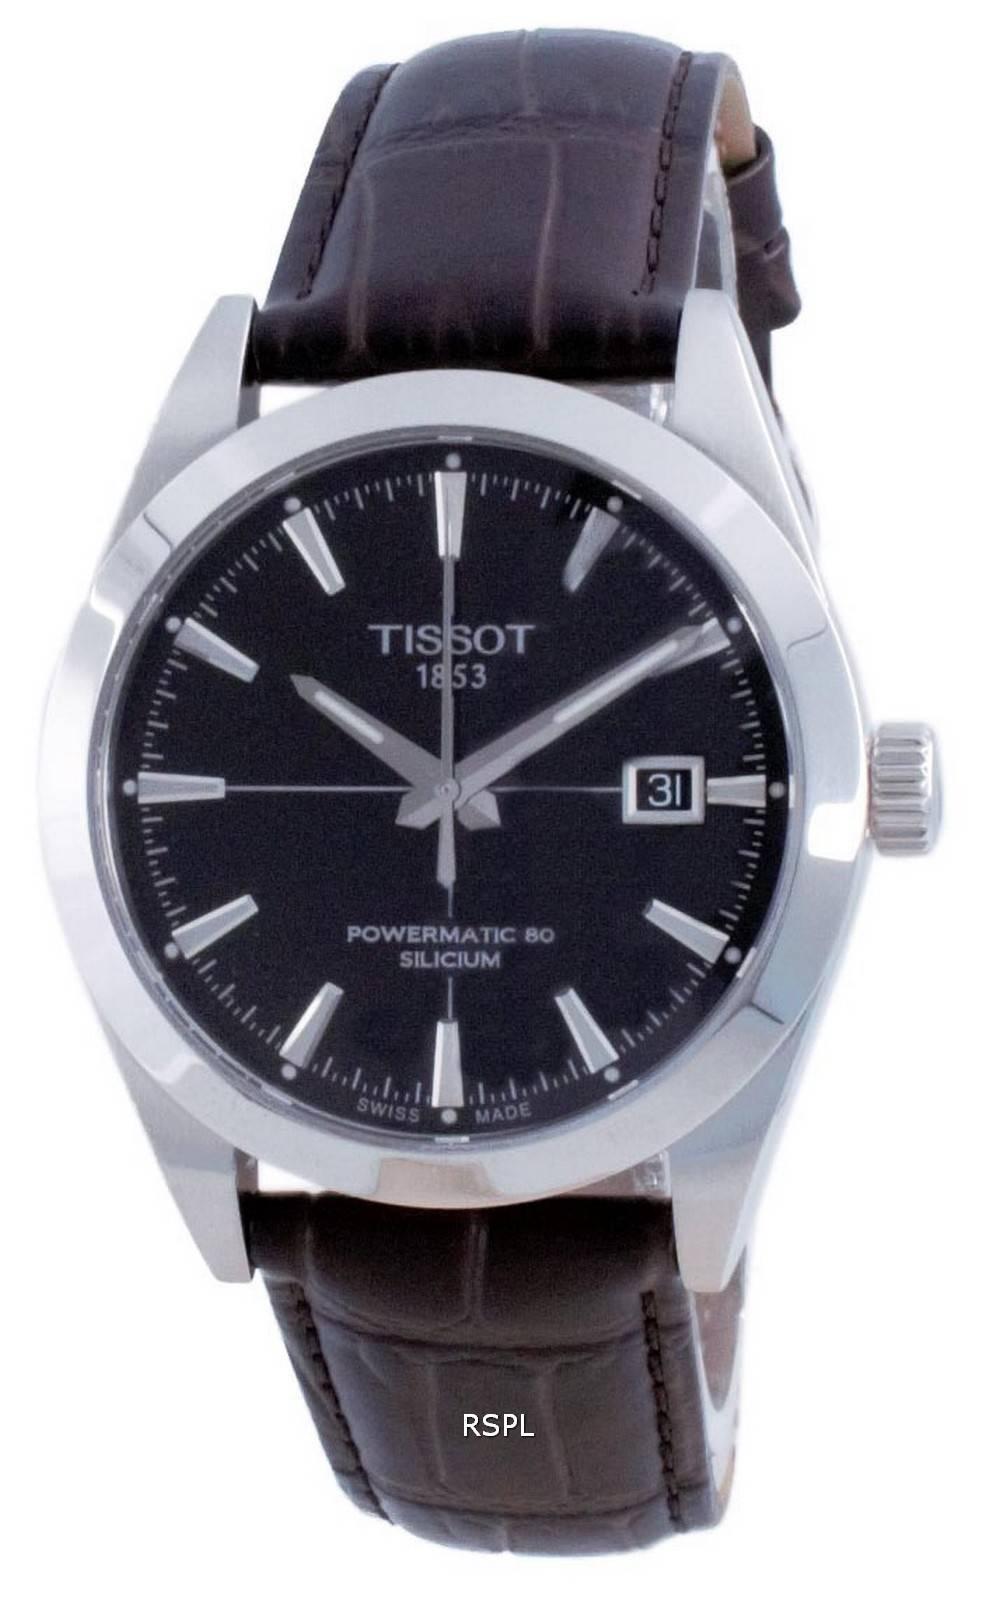 Tissot T-Classic Gentleman Powermatic 80 Silicium Automatic T127.407.16.051.01 T1274071605101 100M miesten kello